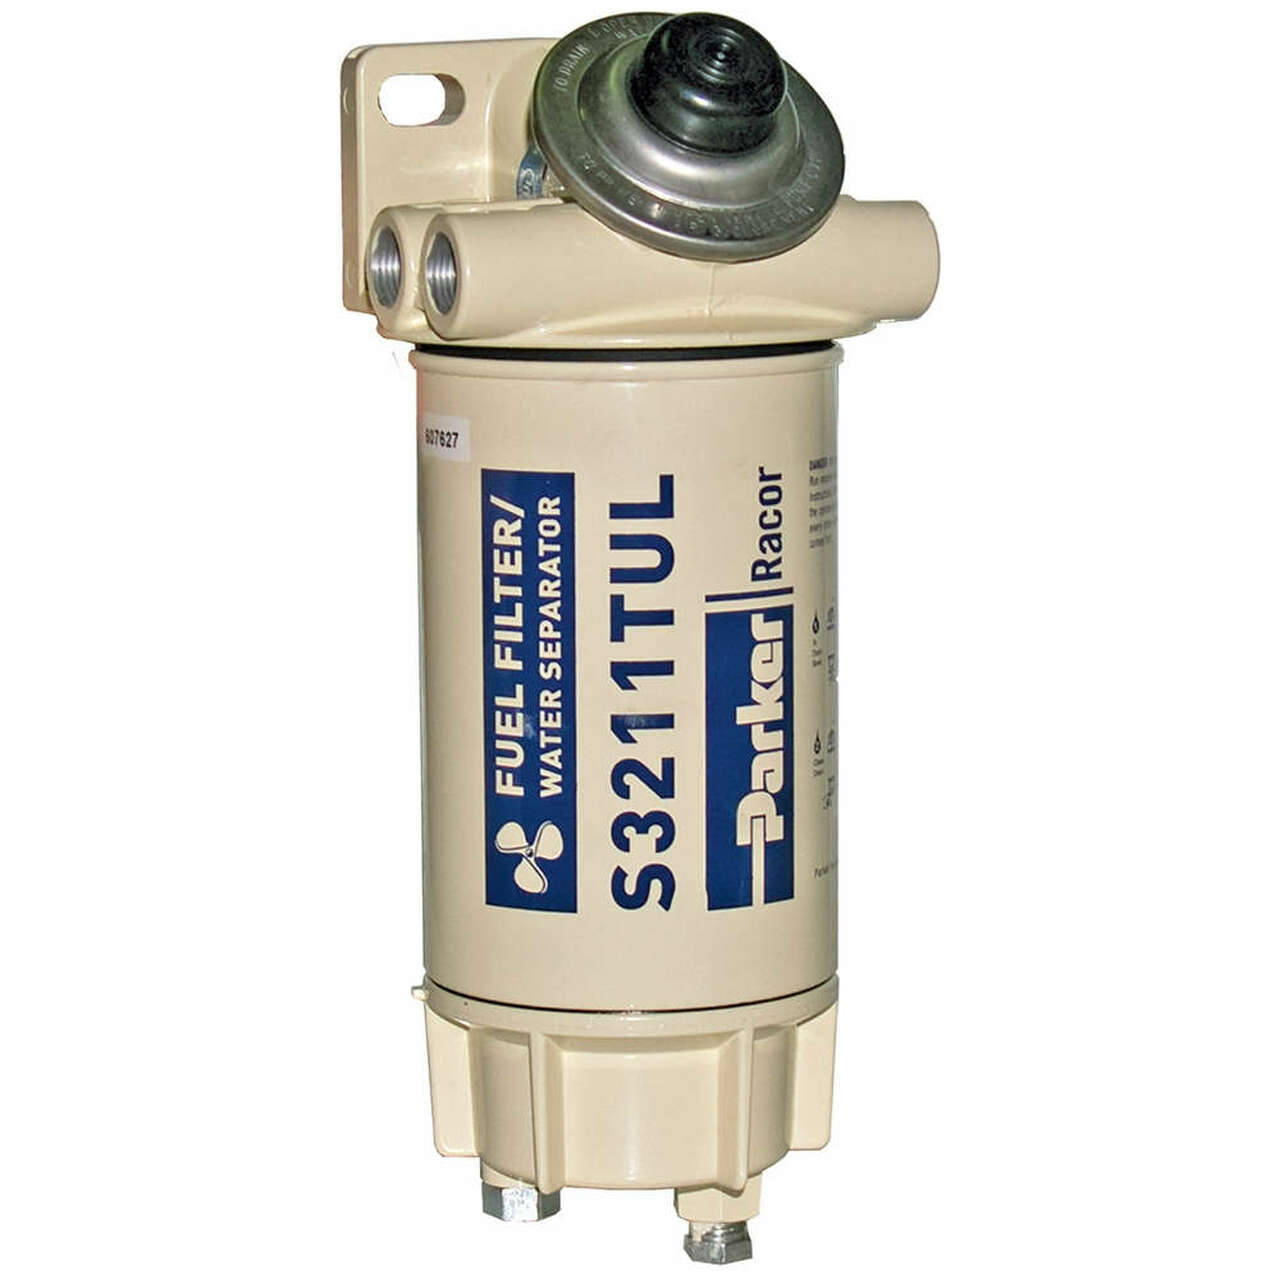 Fuel Filter Water Separator 6 2 Diesel Inline Alliance Racor Aquabloc Marine 3 8 In 60 Gph Spin On